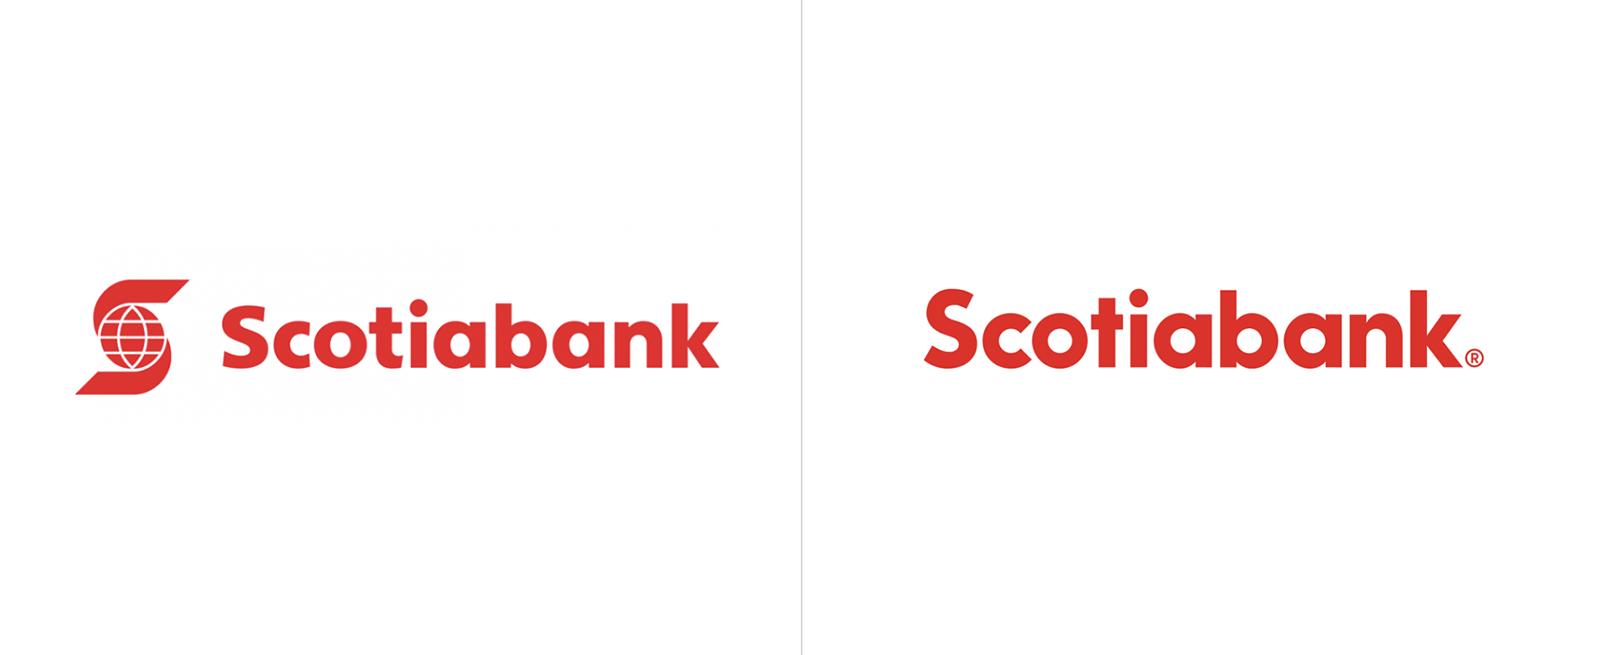 Scotiabank啟用全新的品牌logo和VI視覺形象設計-深圳VI設計1